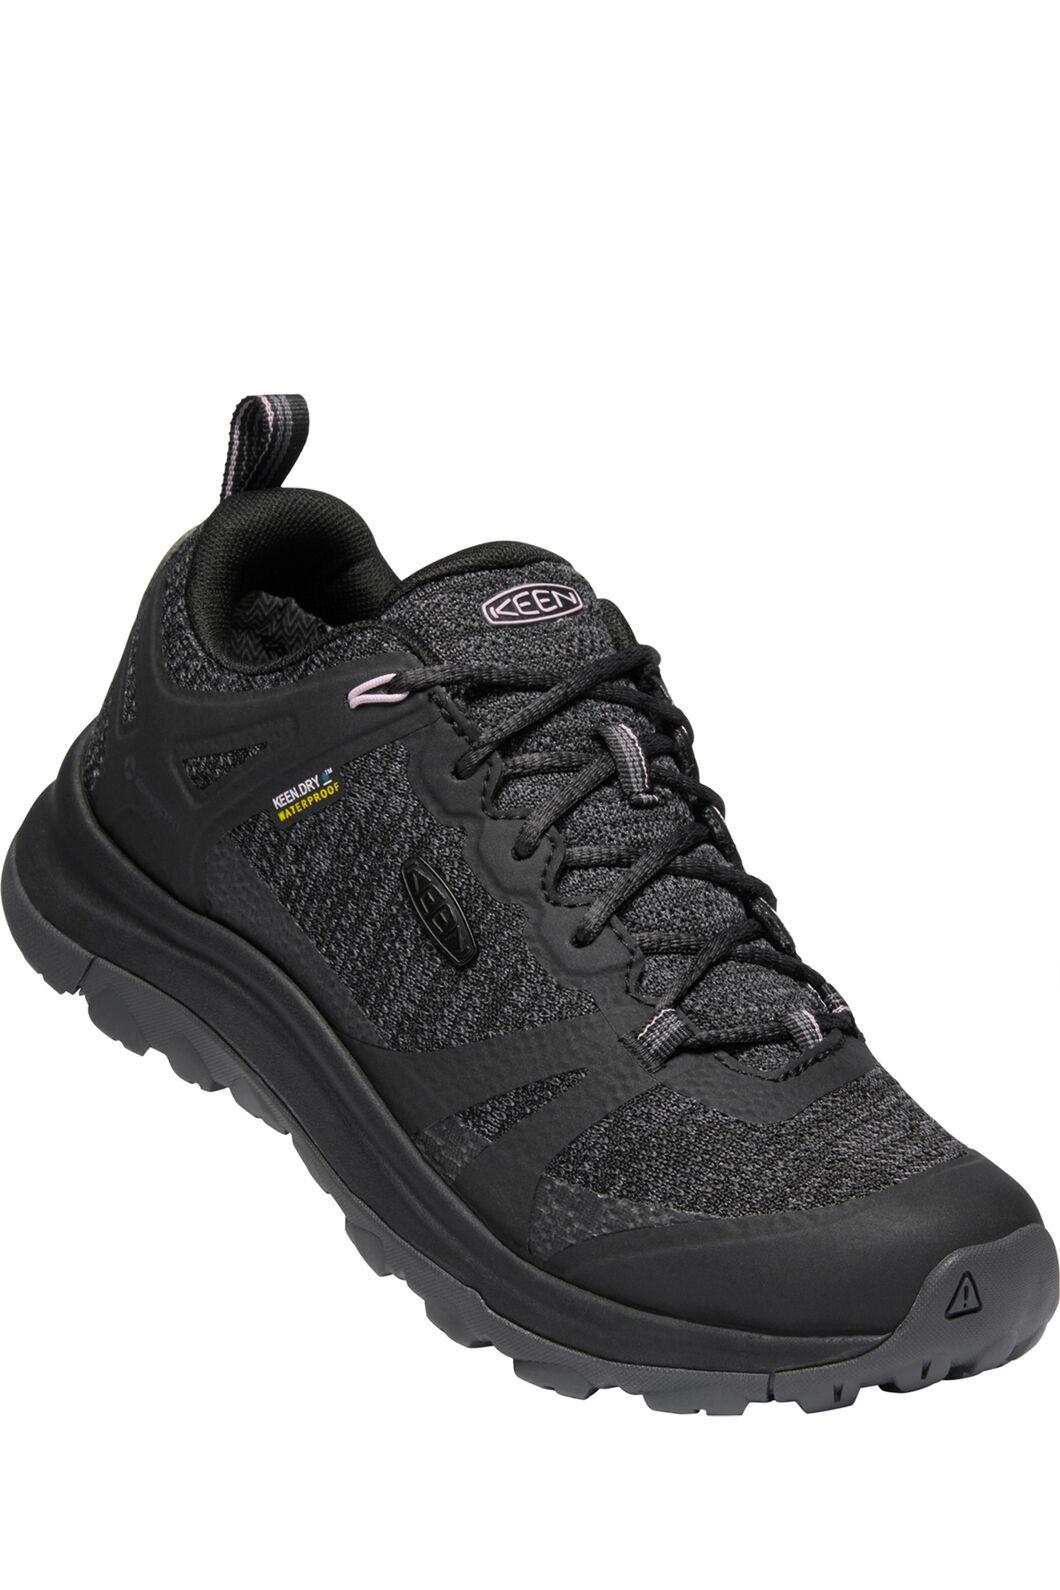 Keen Women's Terradora II Low WP Hiking Shoes, Black Magnet, hi-res